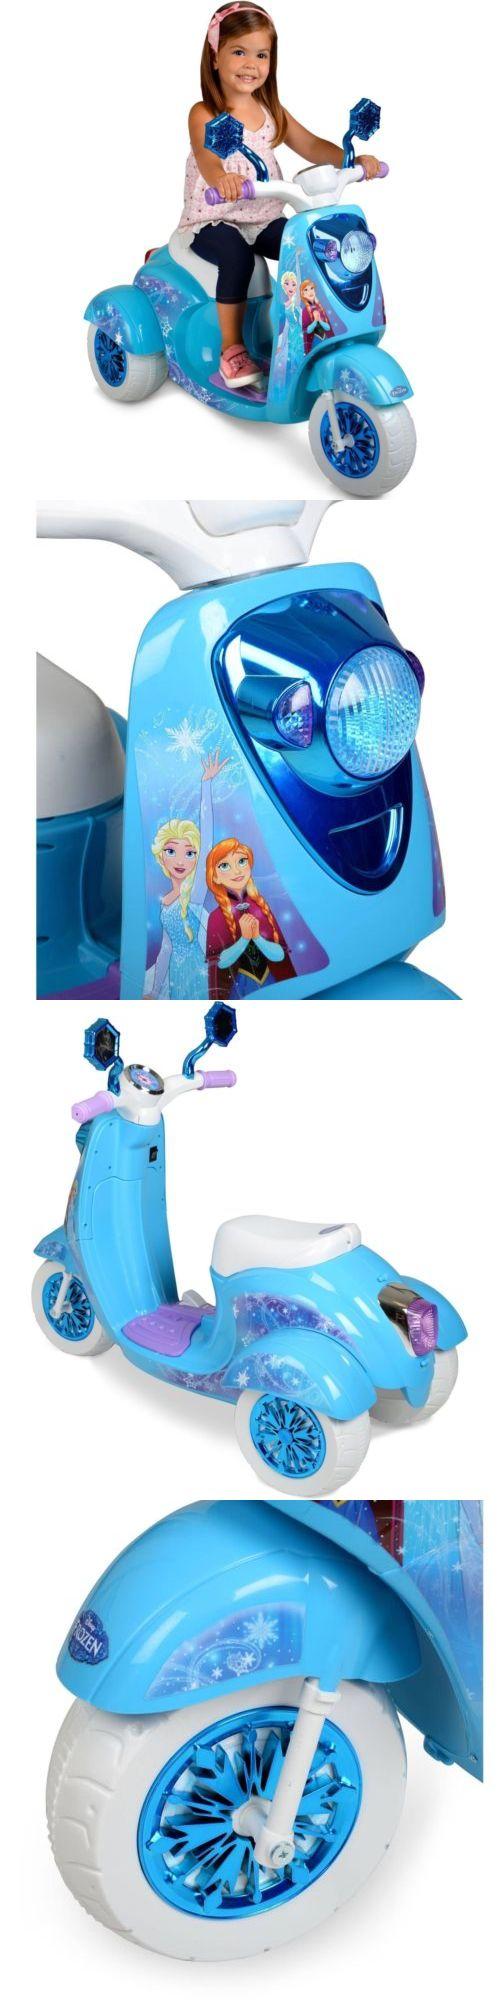 Disney Princesses 146030: Disney Frozen Scooter Ride On Kids Toy Girls Bike Elsa Anna 6V Battery Electric -> BUY IT NOW ONLY: $84.87 on eBay!